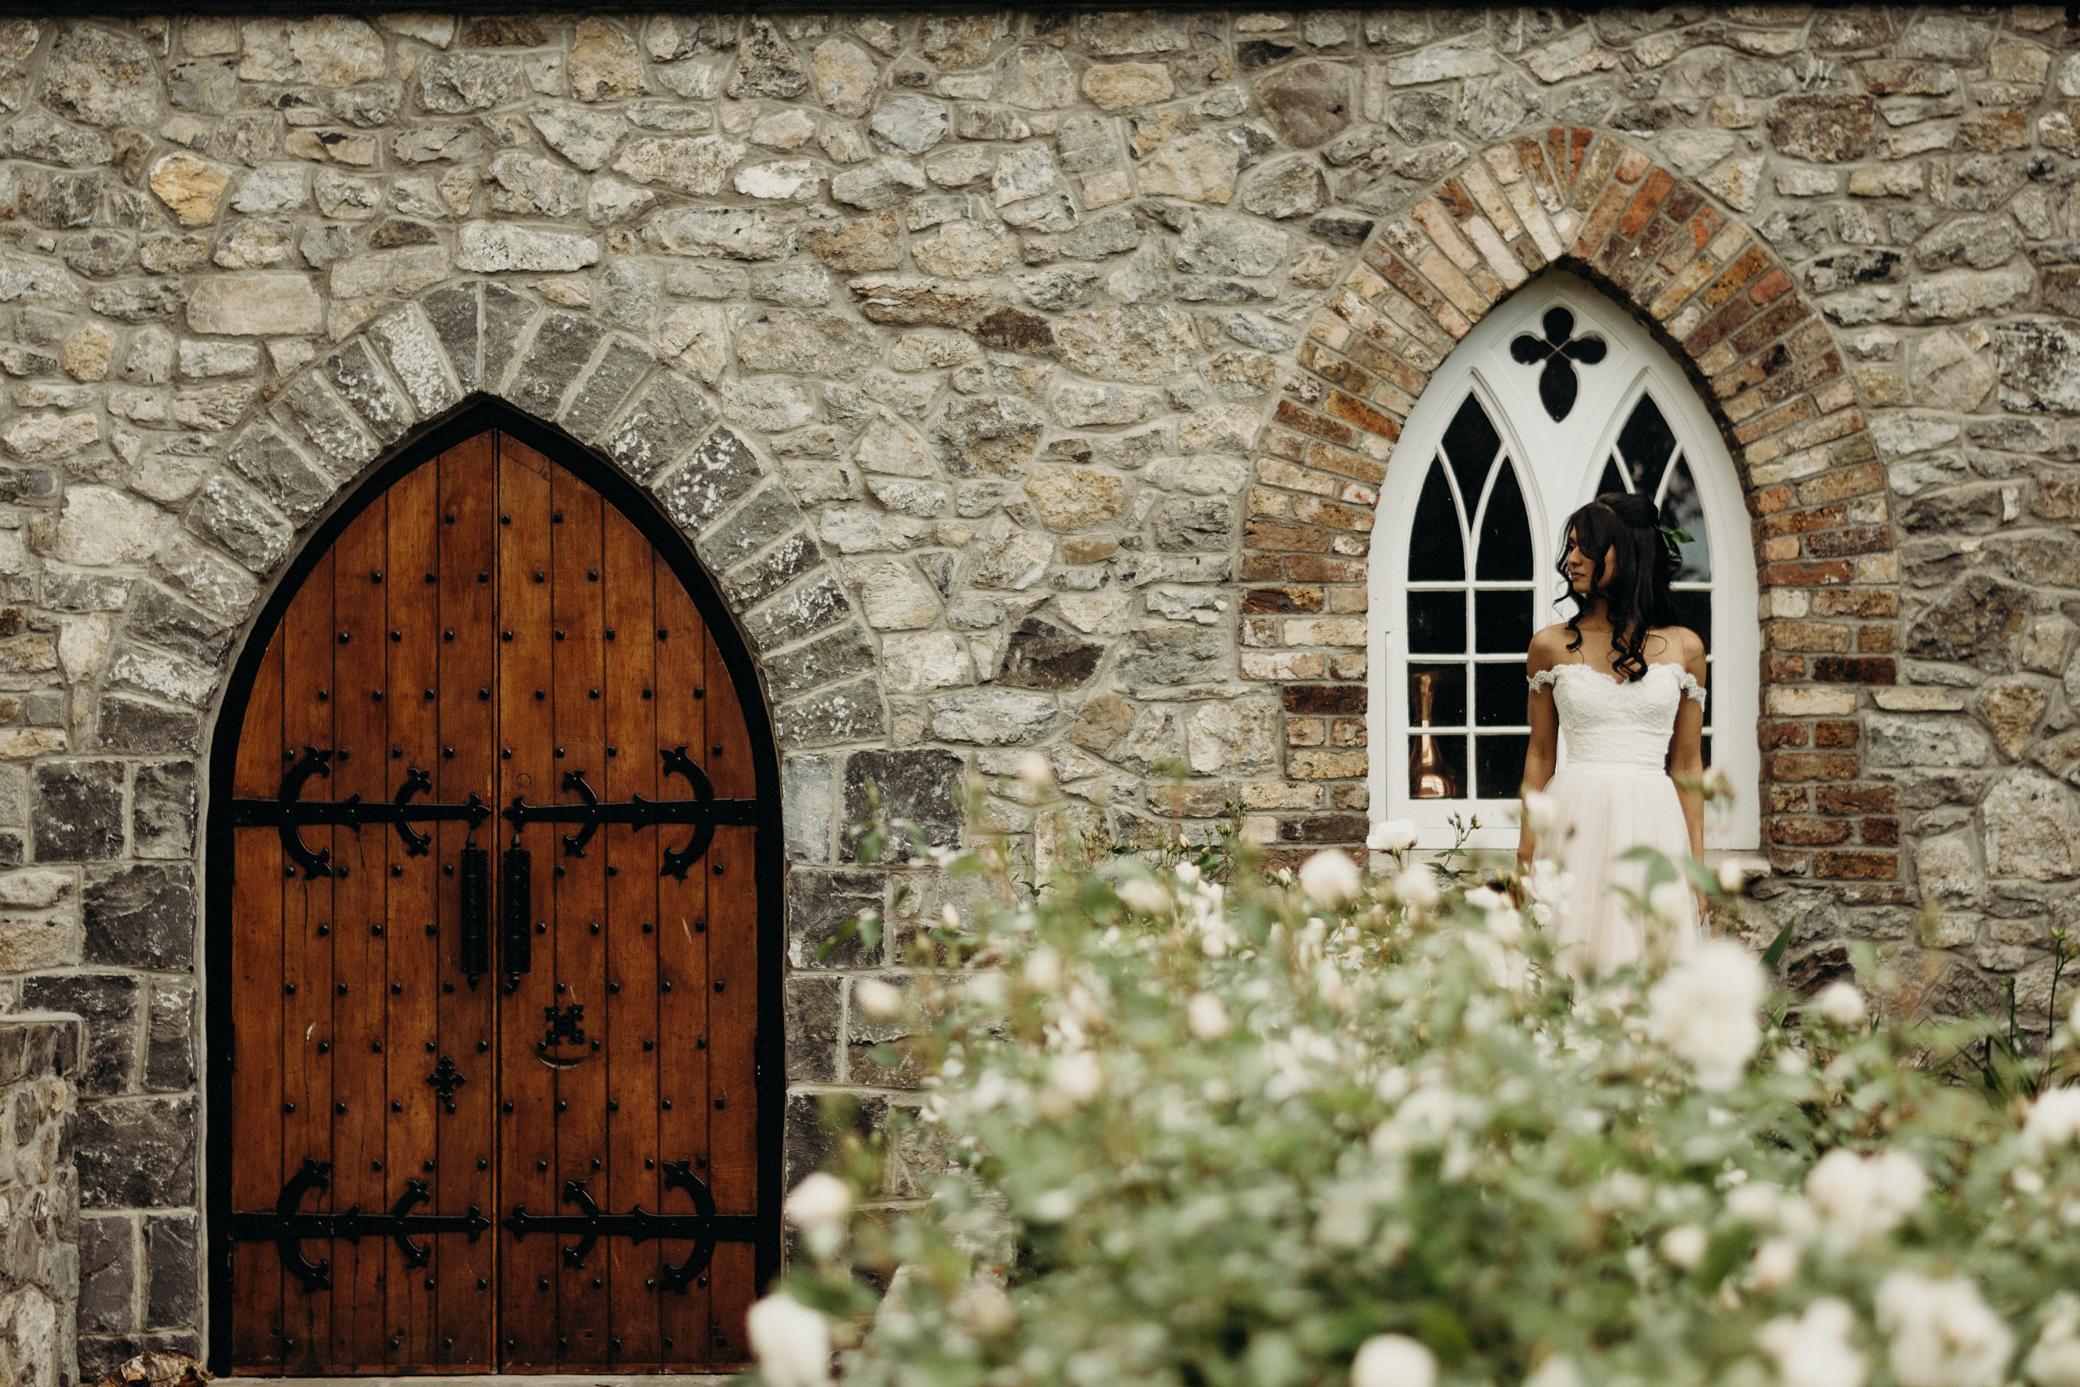 Alan&Naz- Barberstown Castle Wedding - Wedding photographer Ireland-163.jpg